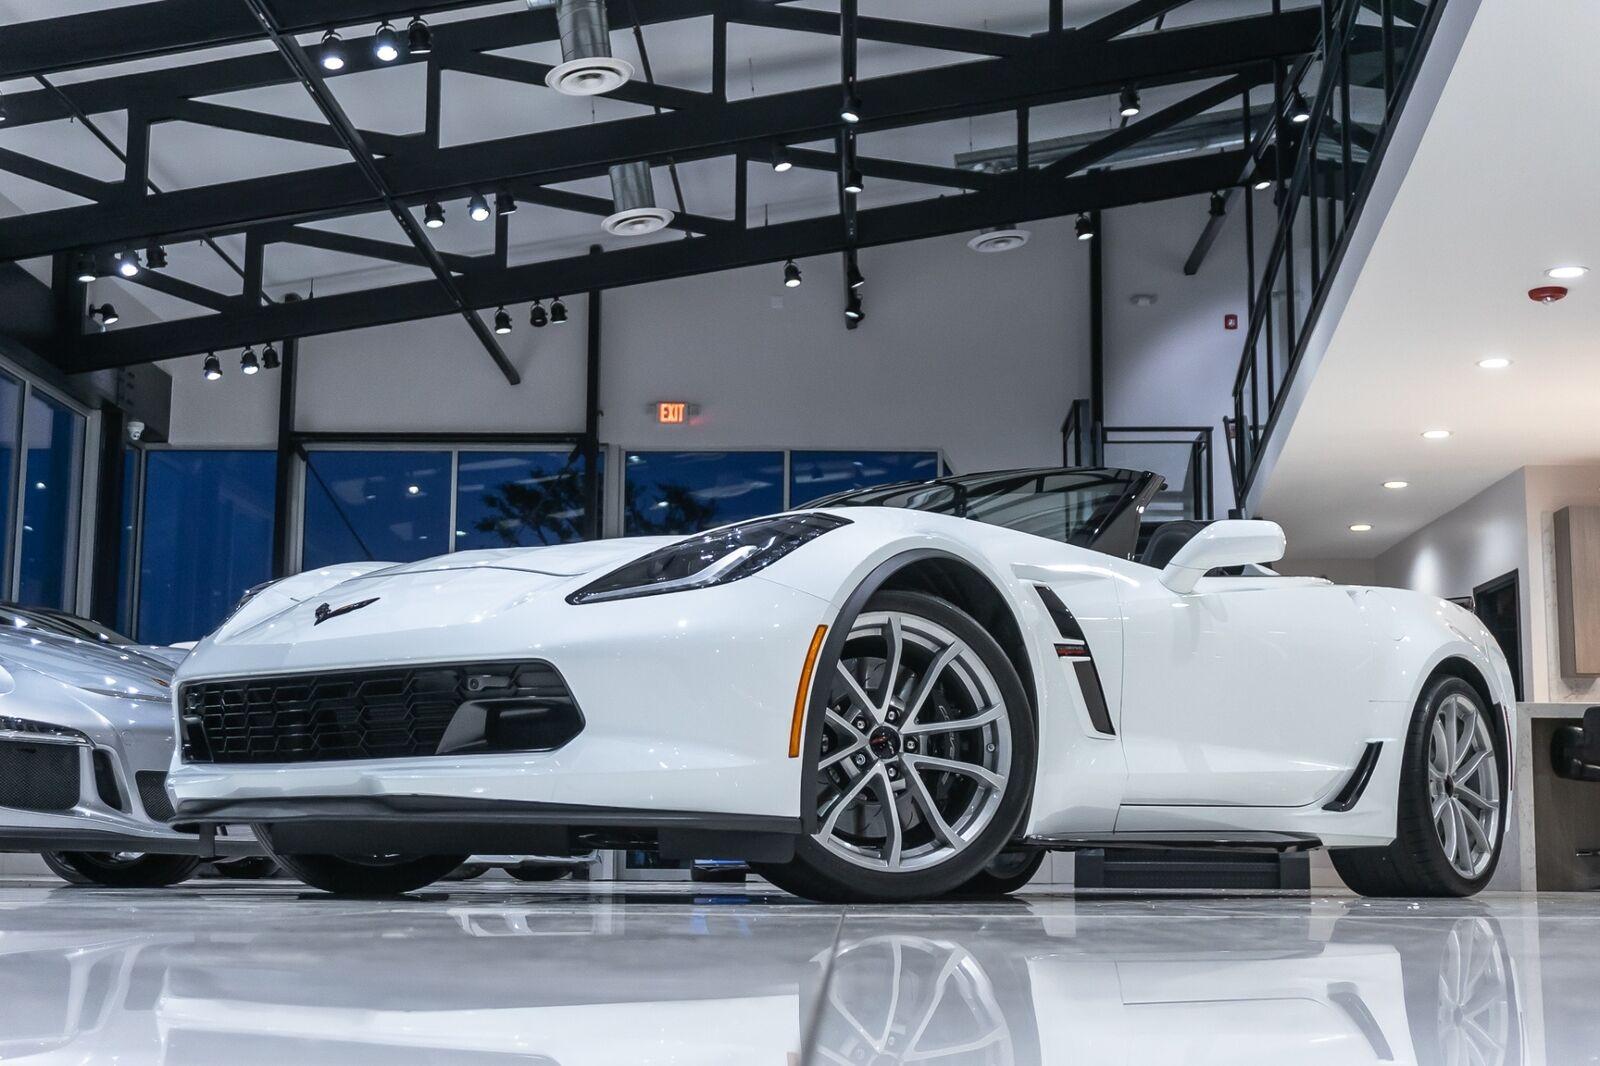 2019 White Chevrolet Corvette Convertible 2LT | C7 Corvette Photo 3